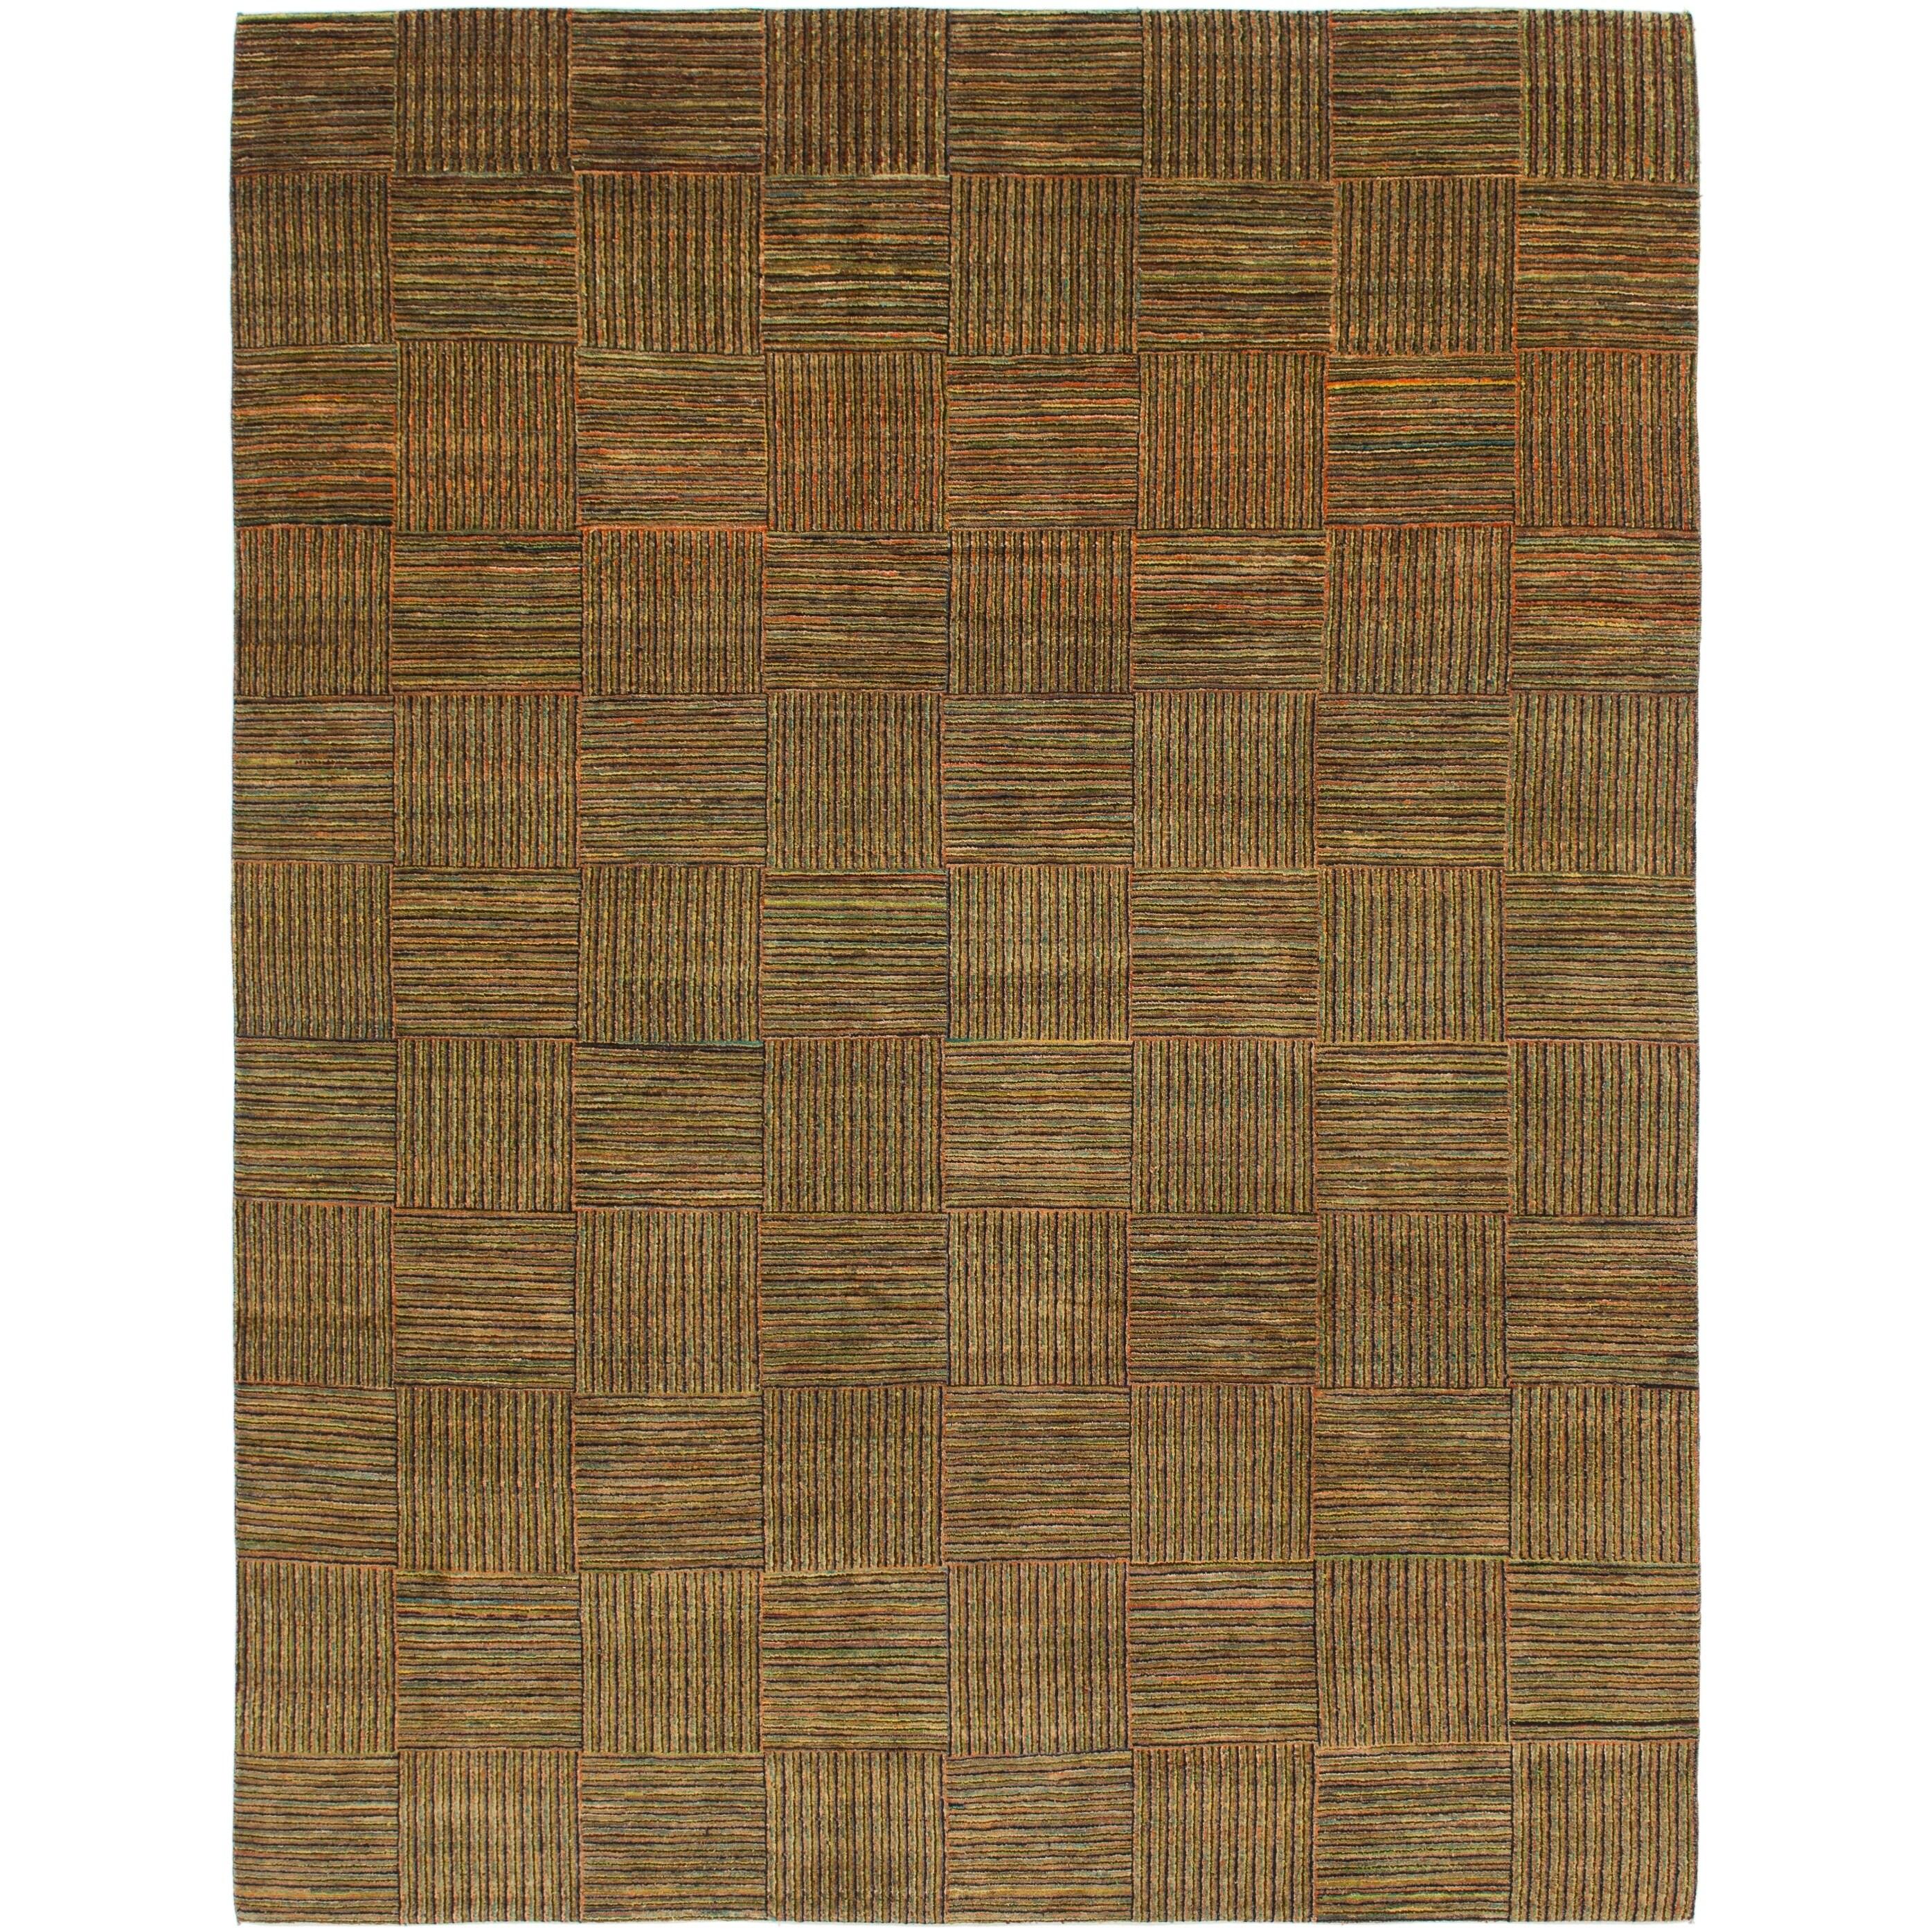 Hand Knotted Kashkuli Gabbeh Wool Area Rug - 8 2 x 10 8 (Multi - 8 2 x 10 8)